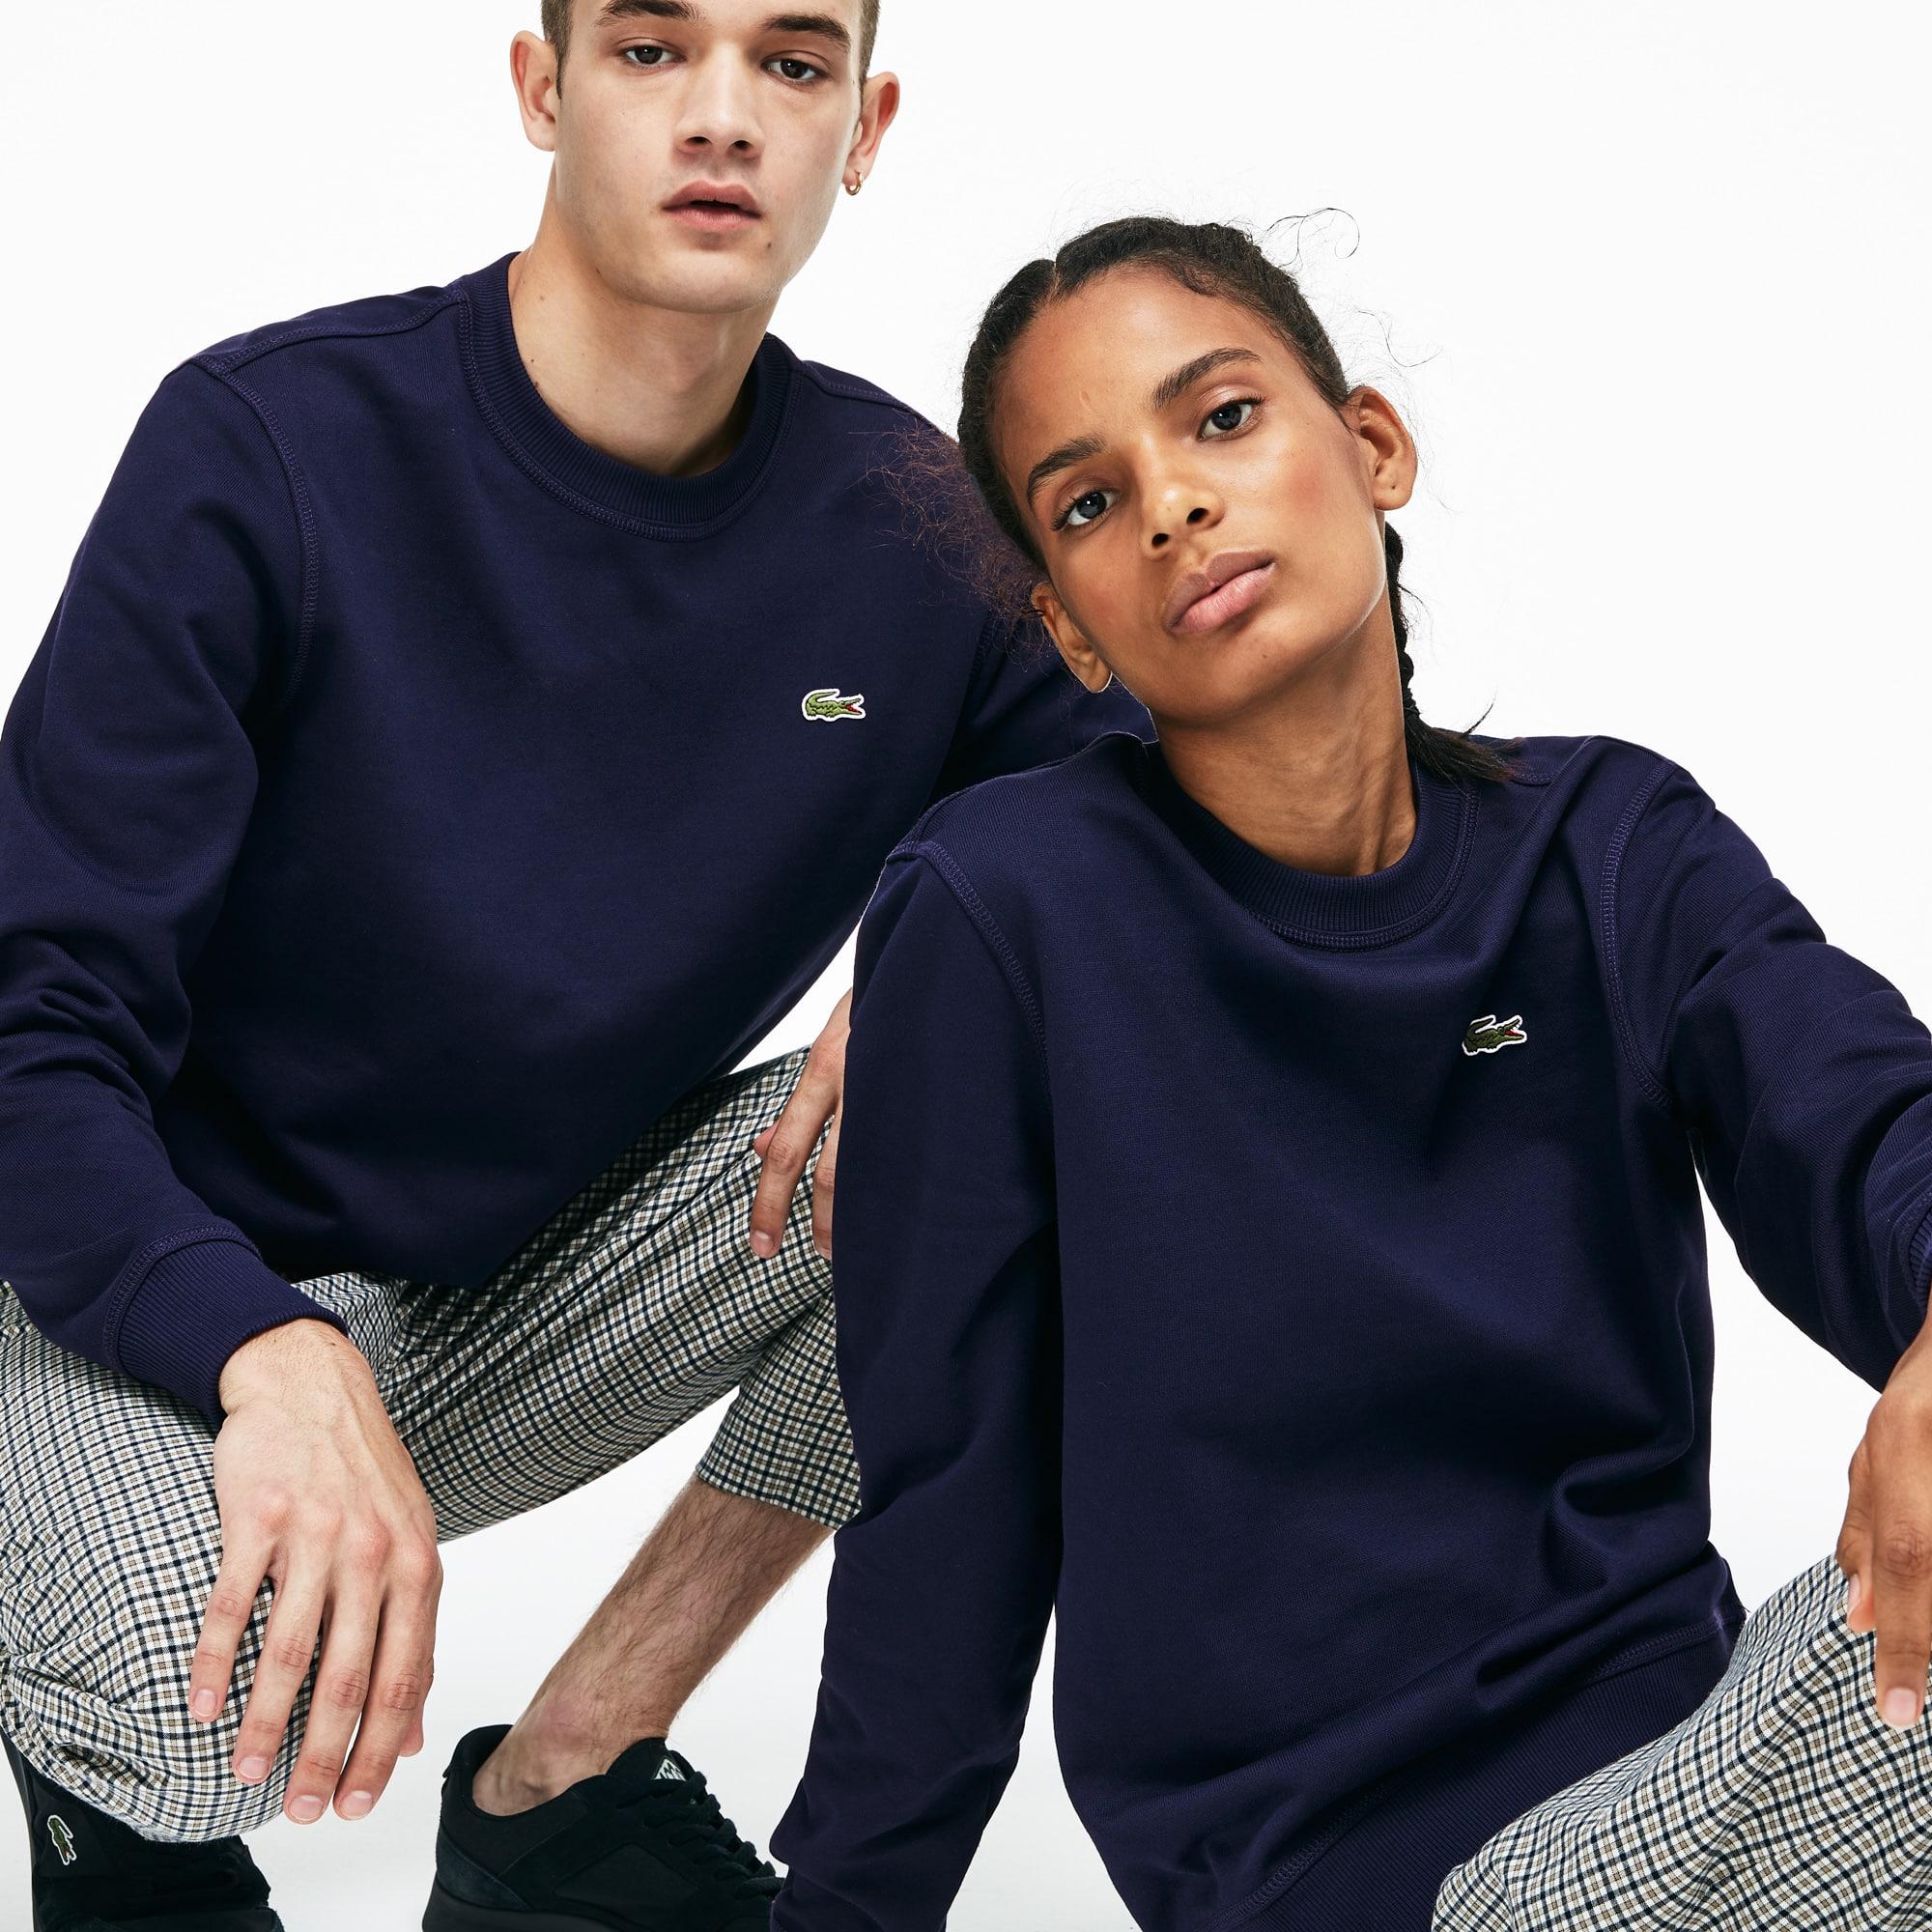 LACOSTE L!VE Rundhals Sweatshirt aus Baumwollfleece